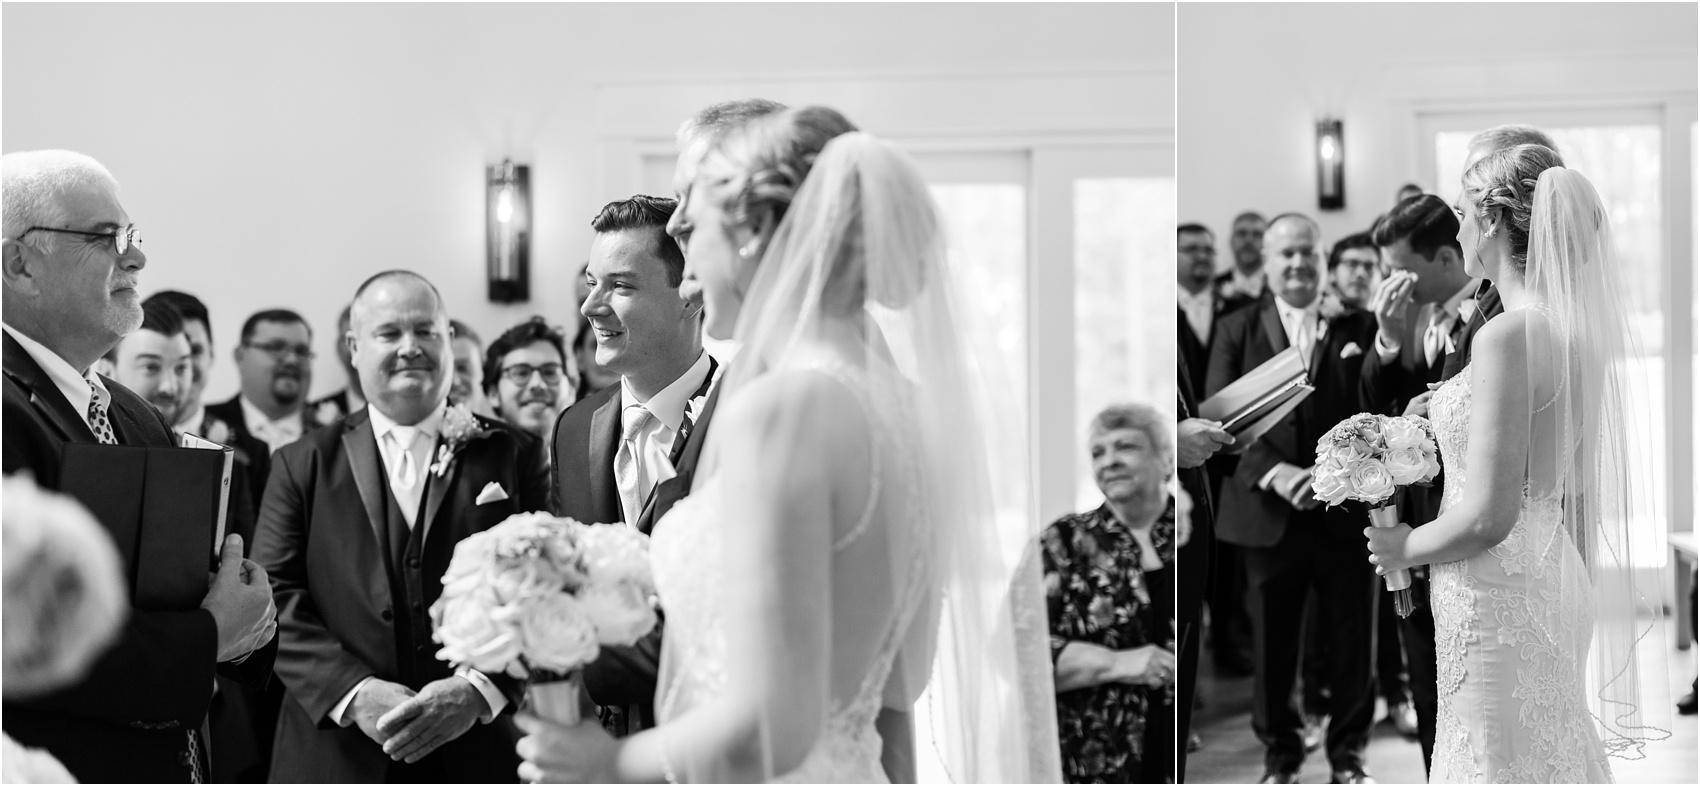 Savannah Eve Photography- Roper-Powell Wedding- Blog-26.jpg